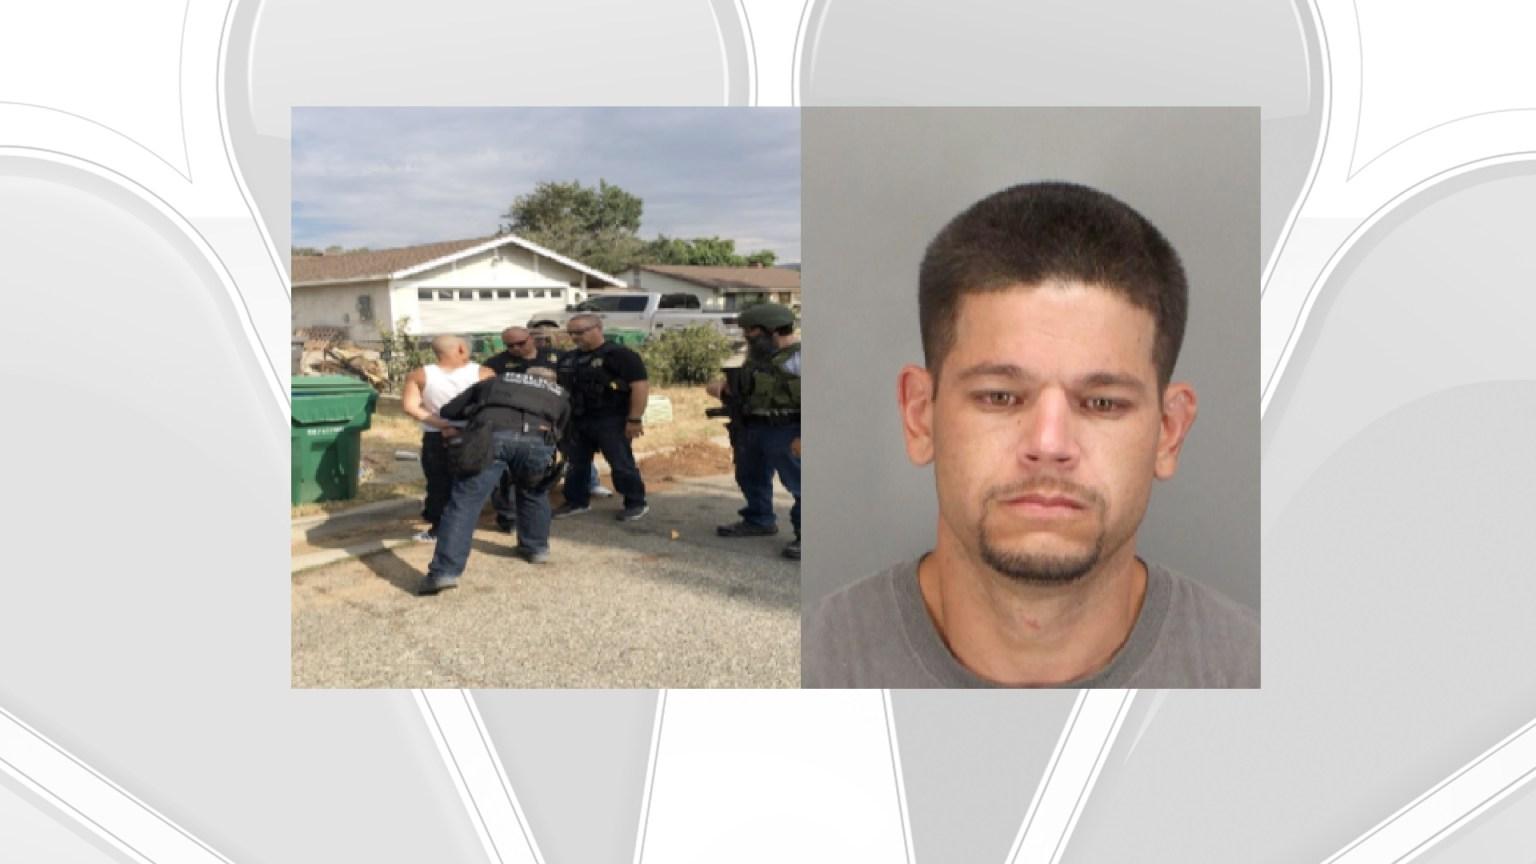 Fugitive From Banning Barricade in Custody